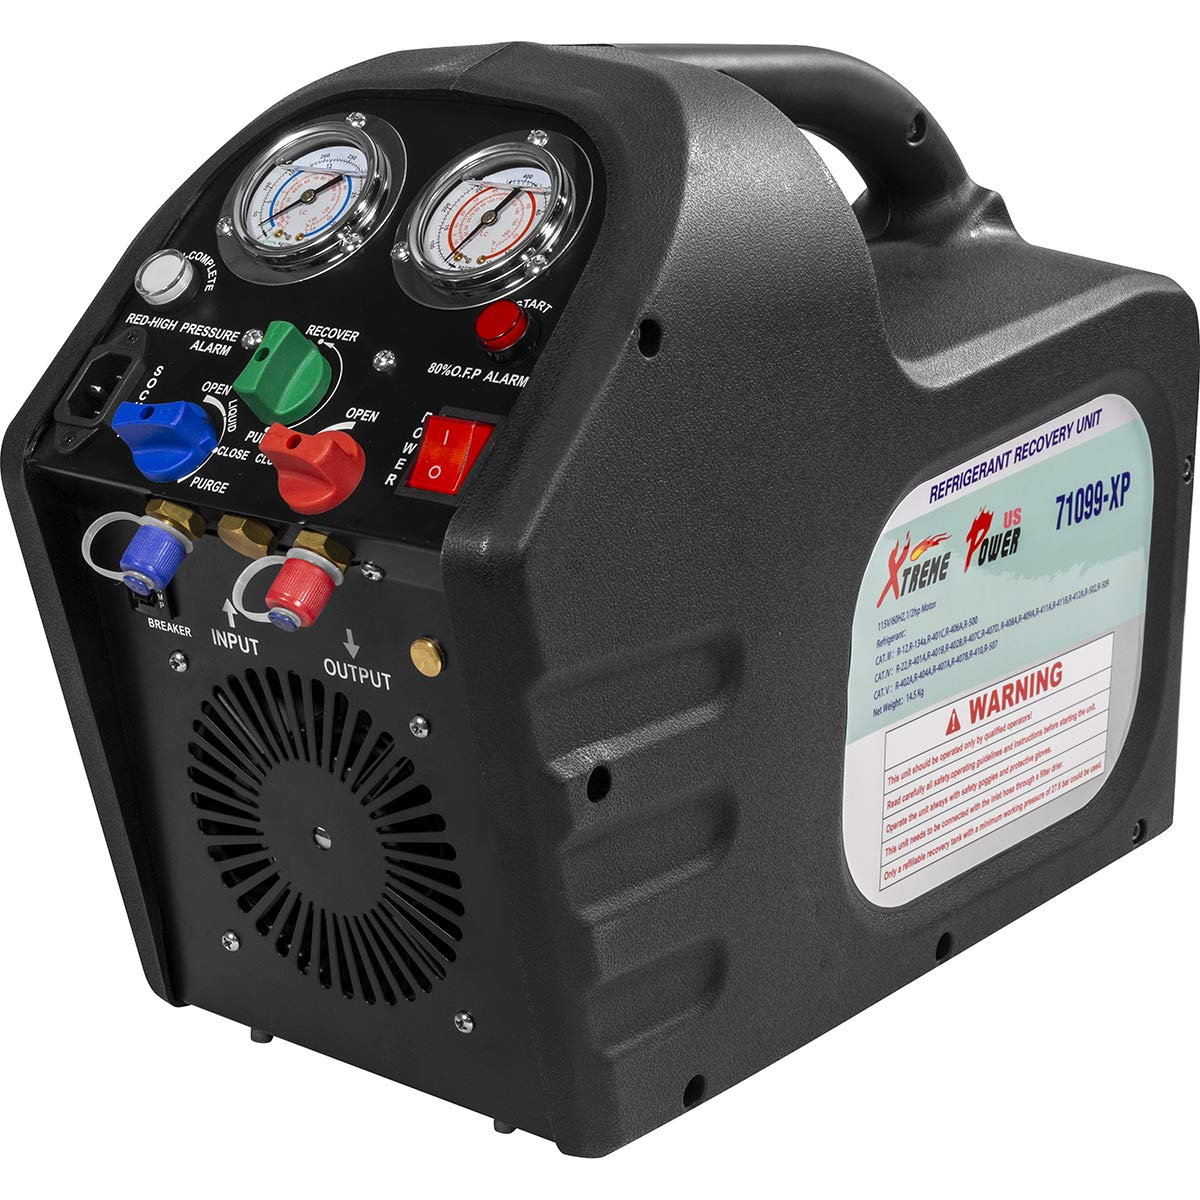 XtremepowerUS 1//2HP Portable Refrigerant Recovery Machine 115V AC Refrigerant Recycling HVAC Refrigerant Air Condition w//Shoulder Strap